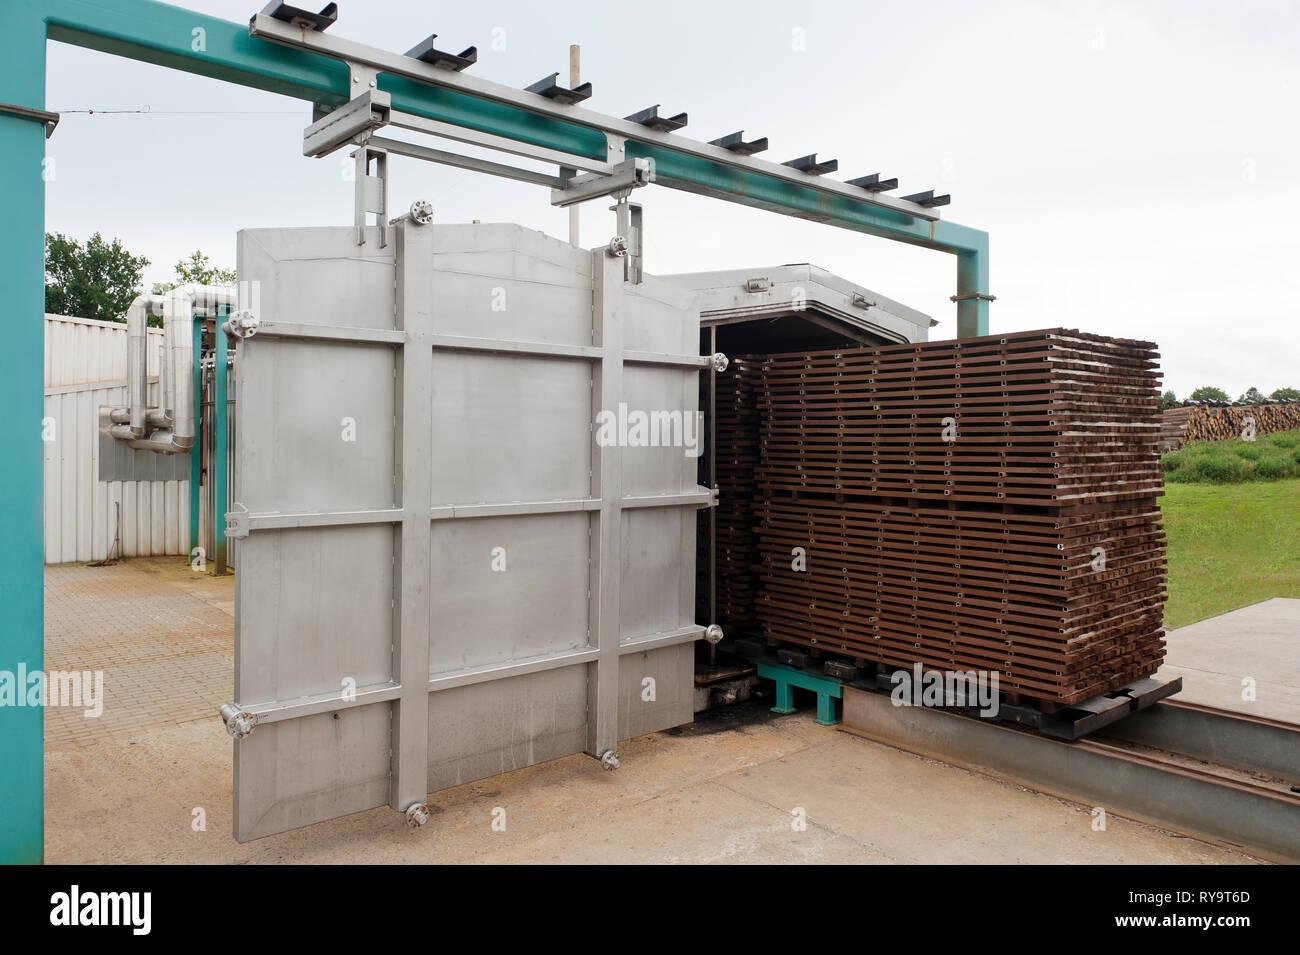 Lumber on conveyor belt in factory - Stock Image